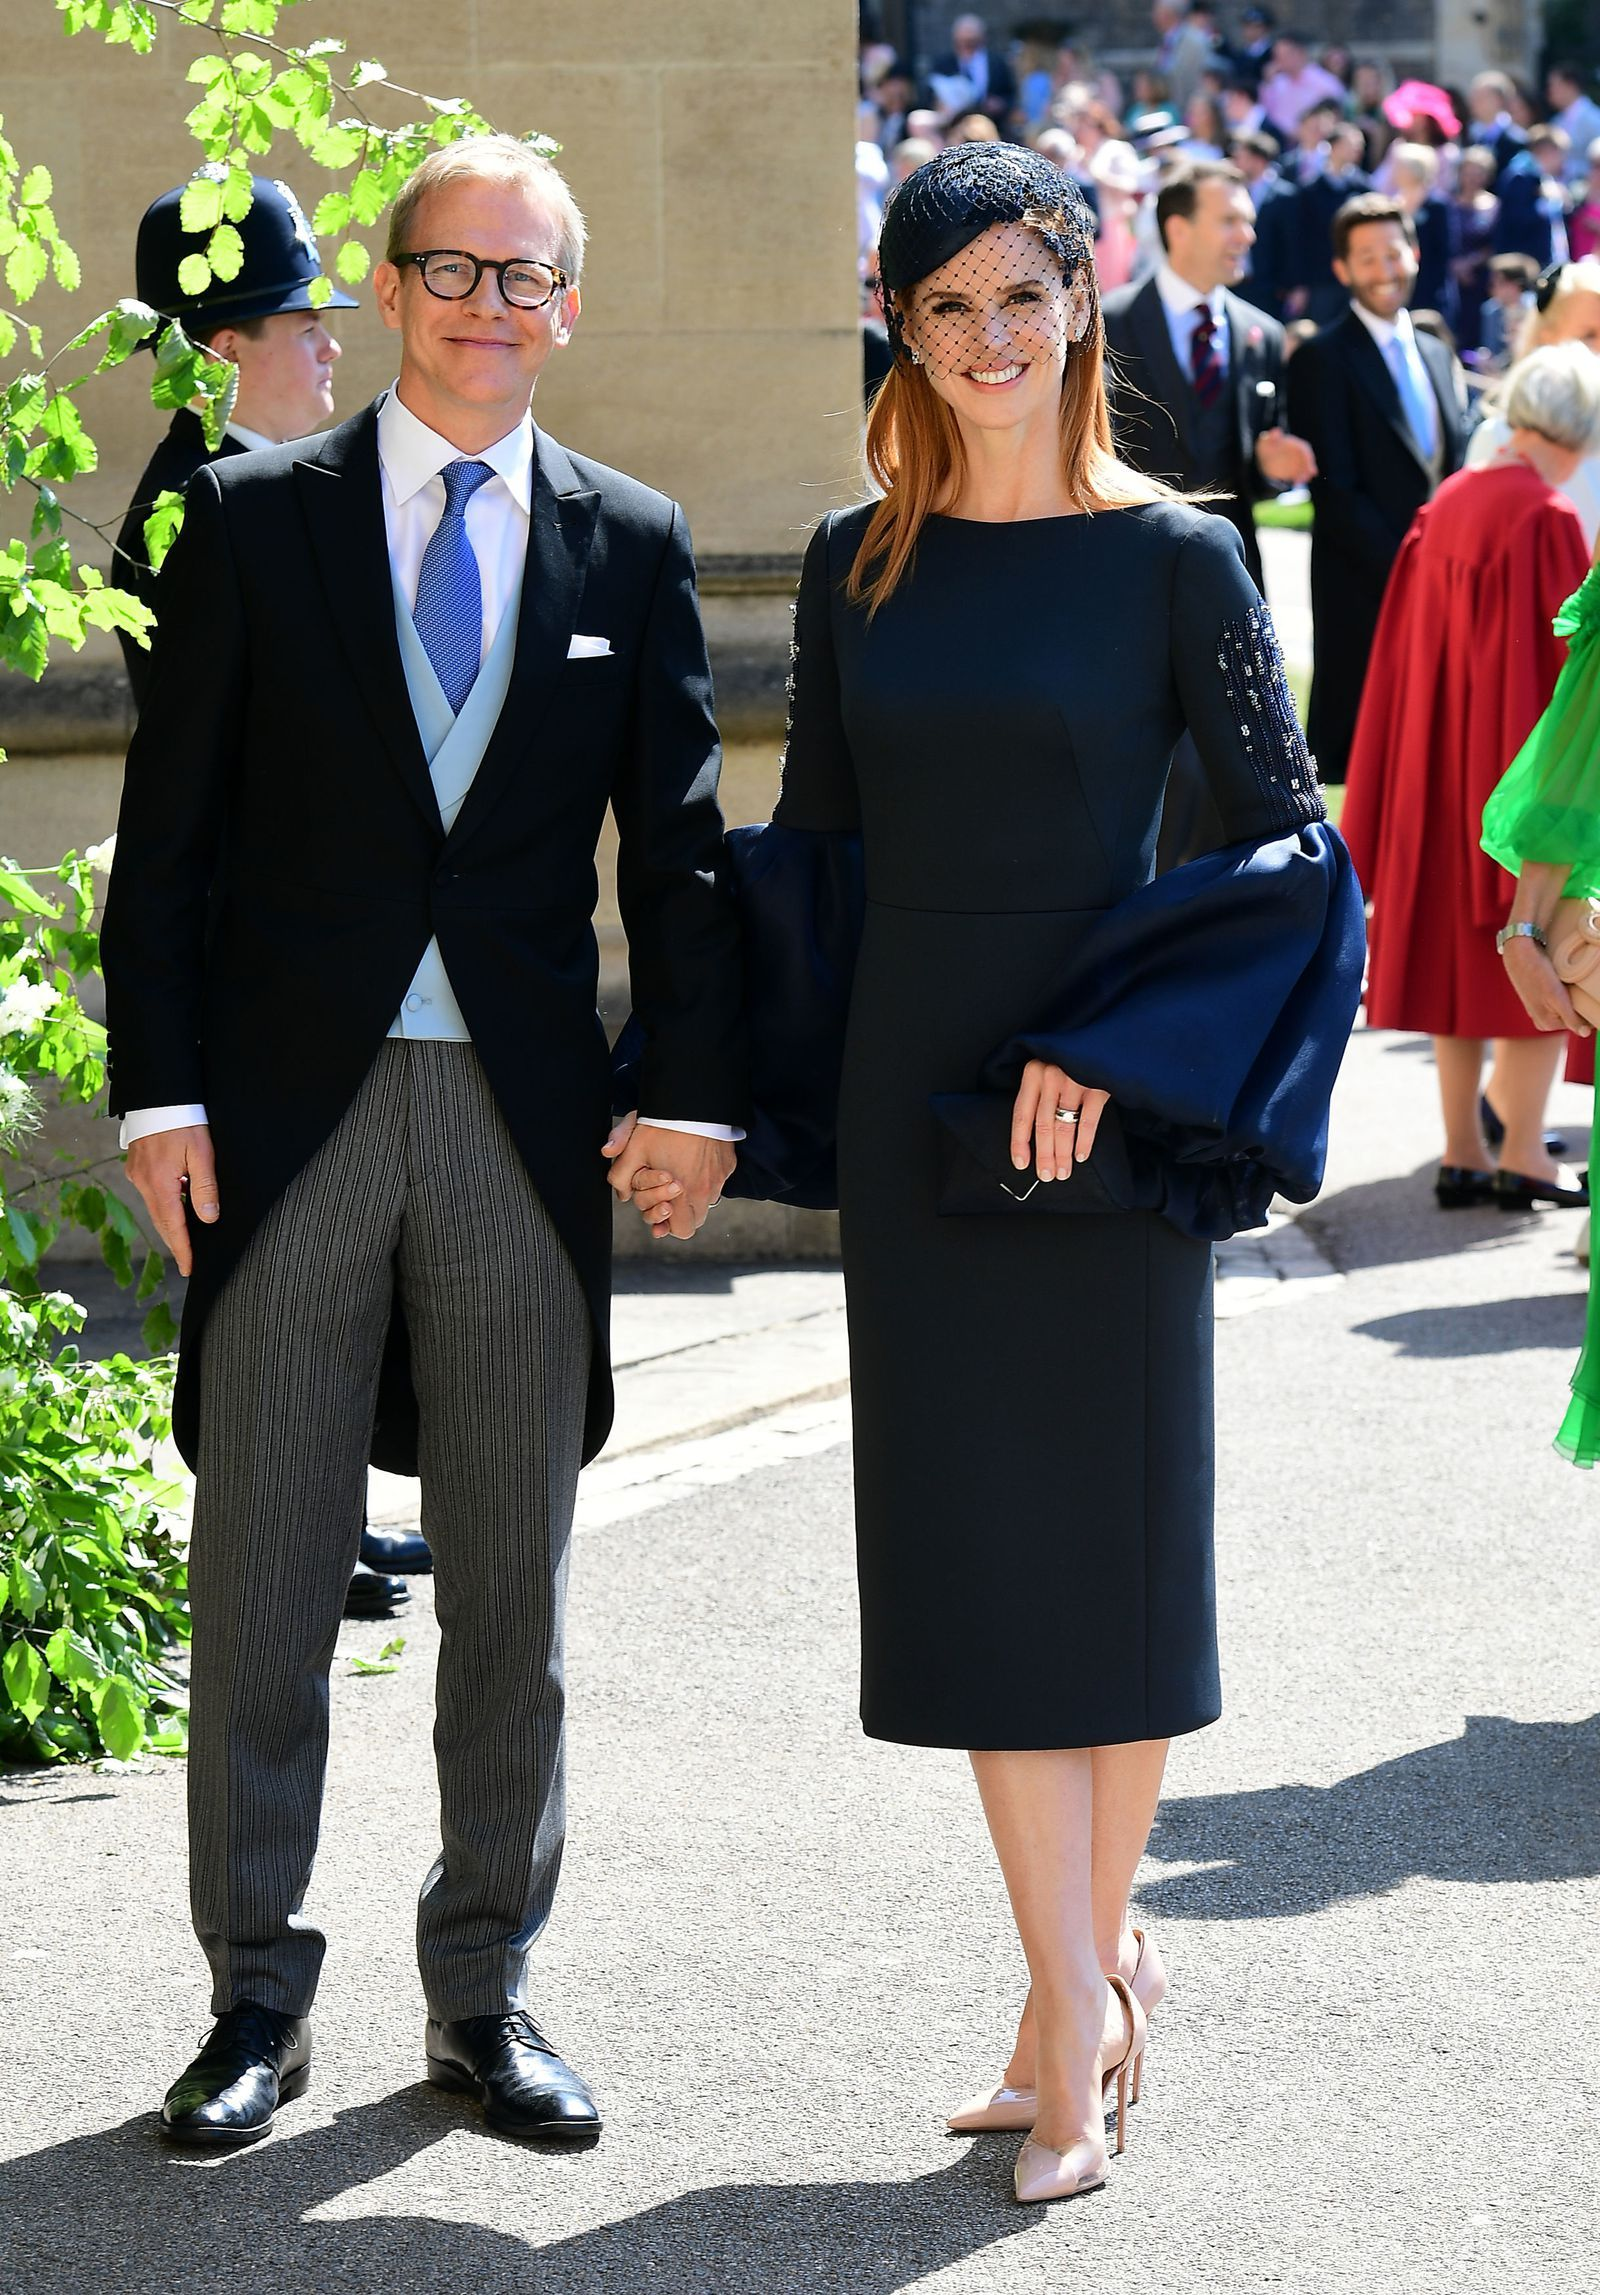 All The Celebrities At Prince Harry And Meghan Markle S Royal Wedding Royal Wedding Outfits Royal Wedding Dress Nice Dresses